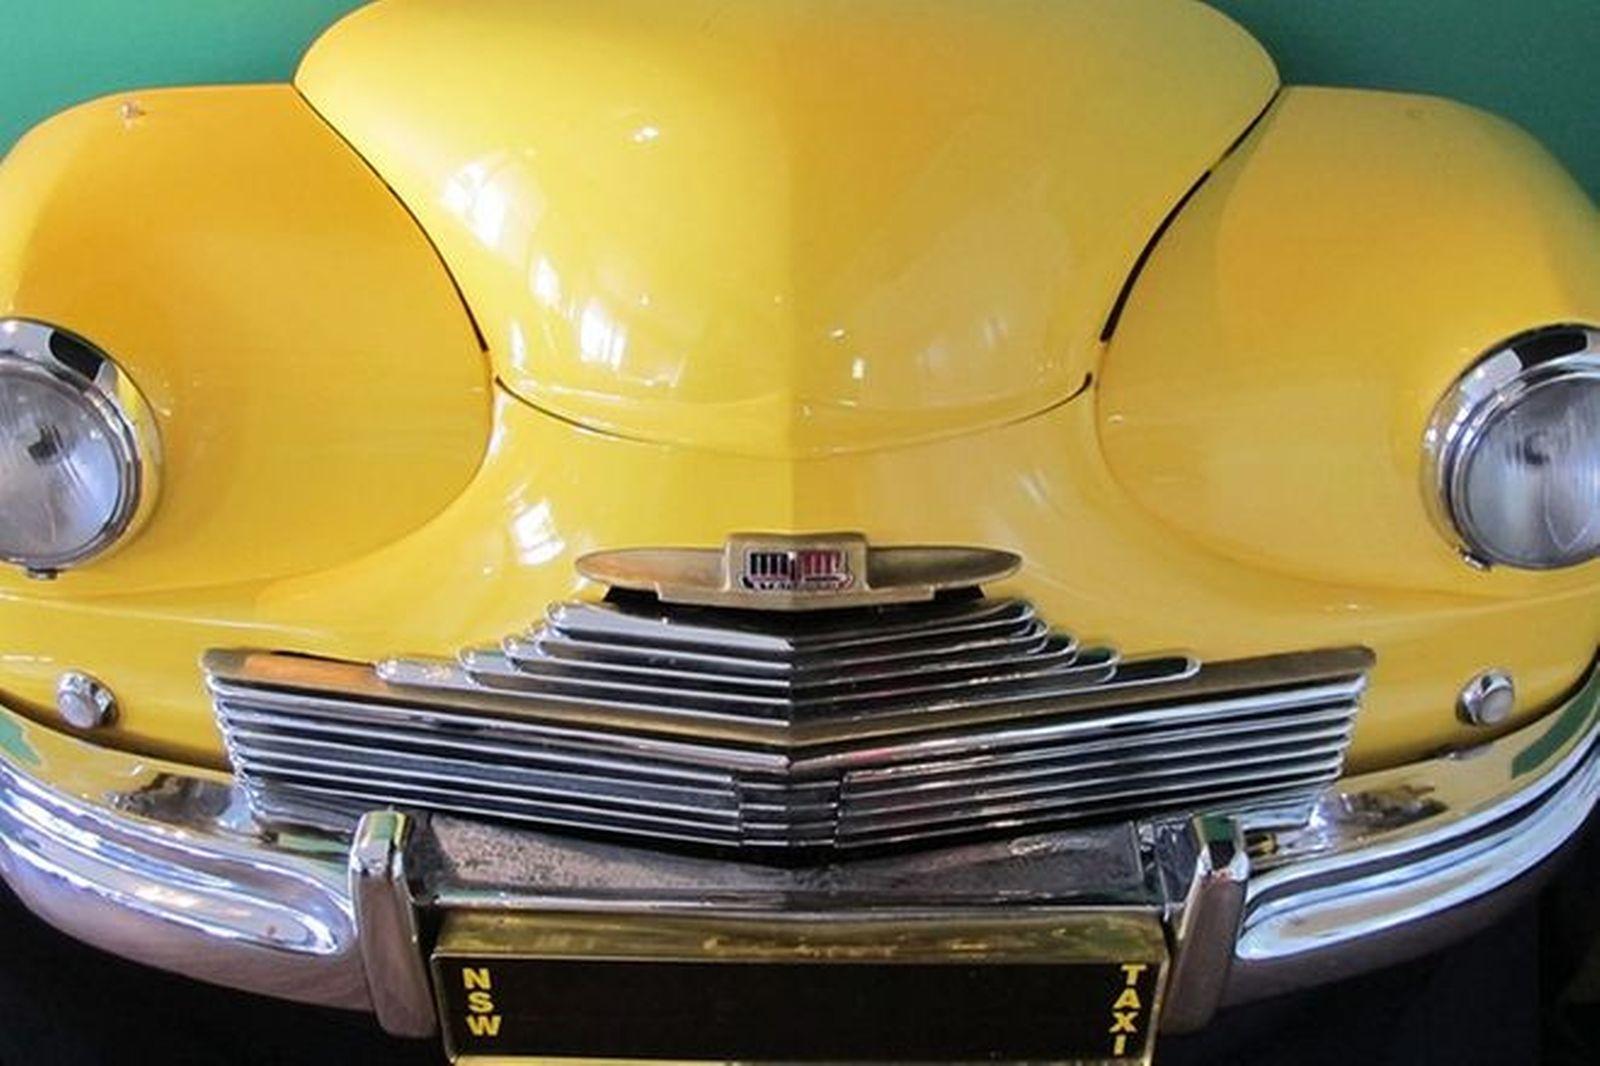 Sold: c1950s Standard Vanguard Front Clip Auctions - Lot AI - Shannons